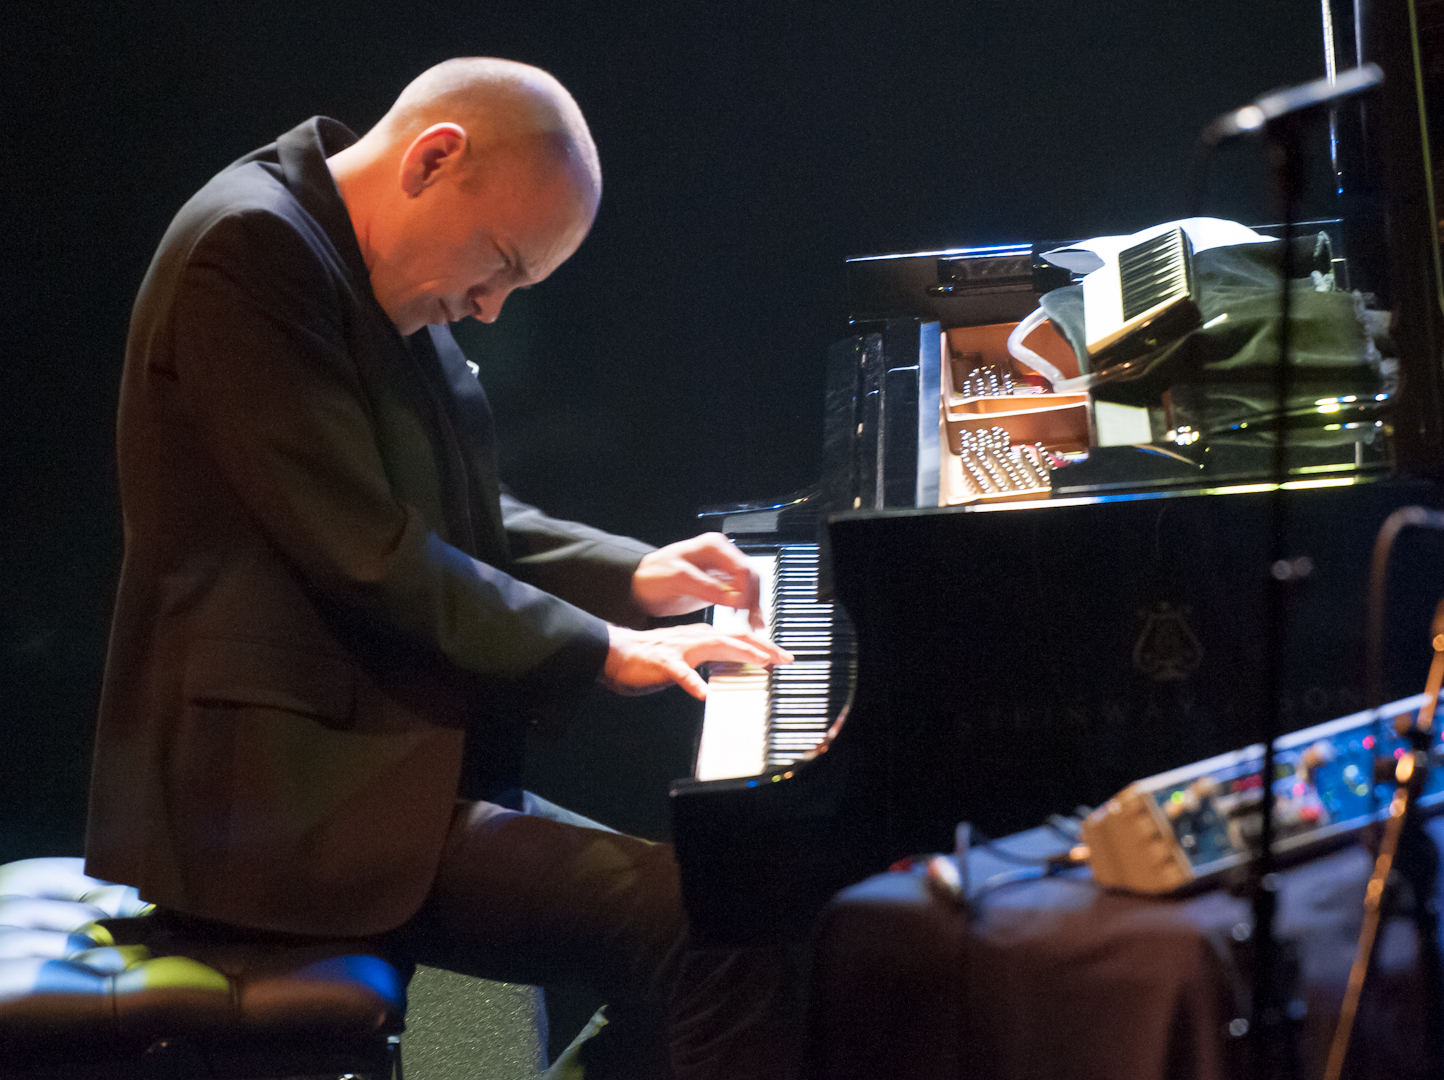 Tord Gustavsen at the Montreal International Jazz Festival 2012